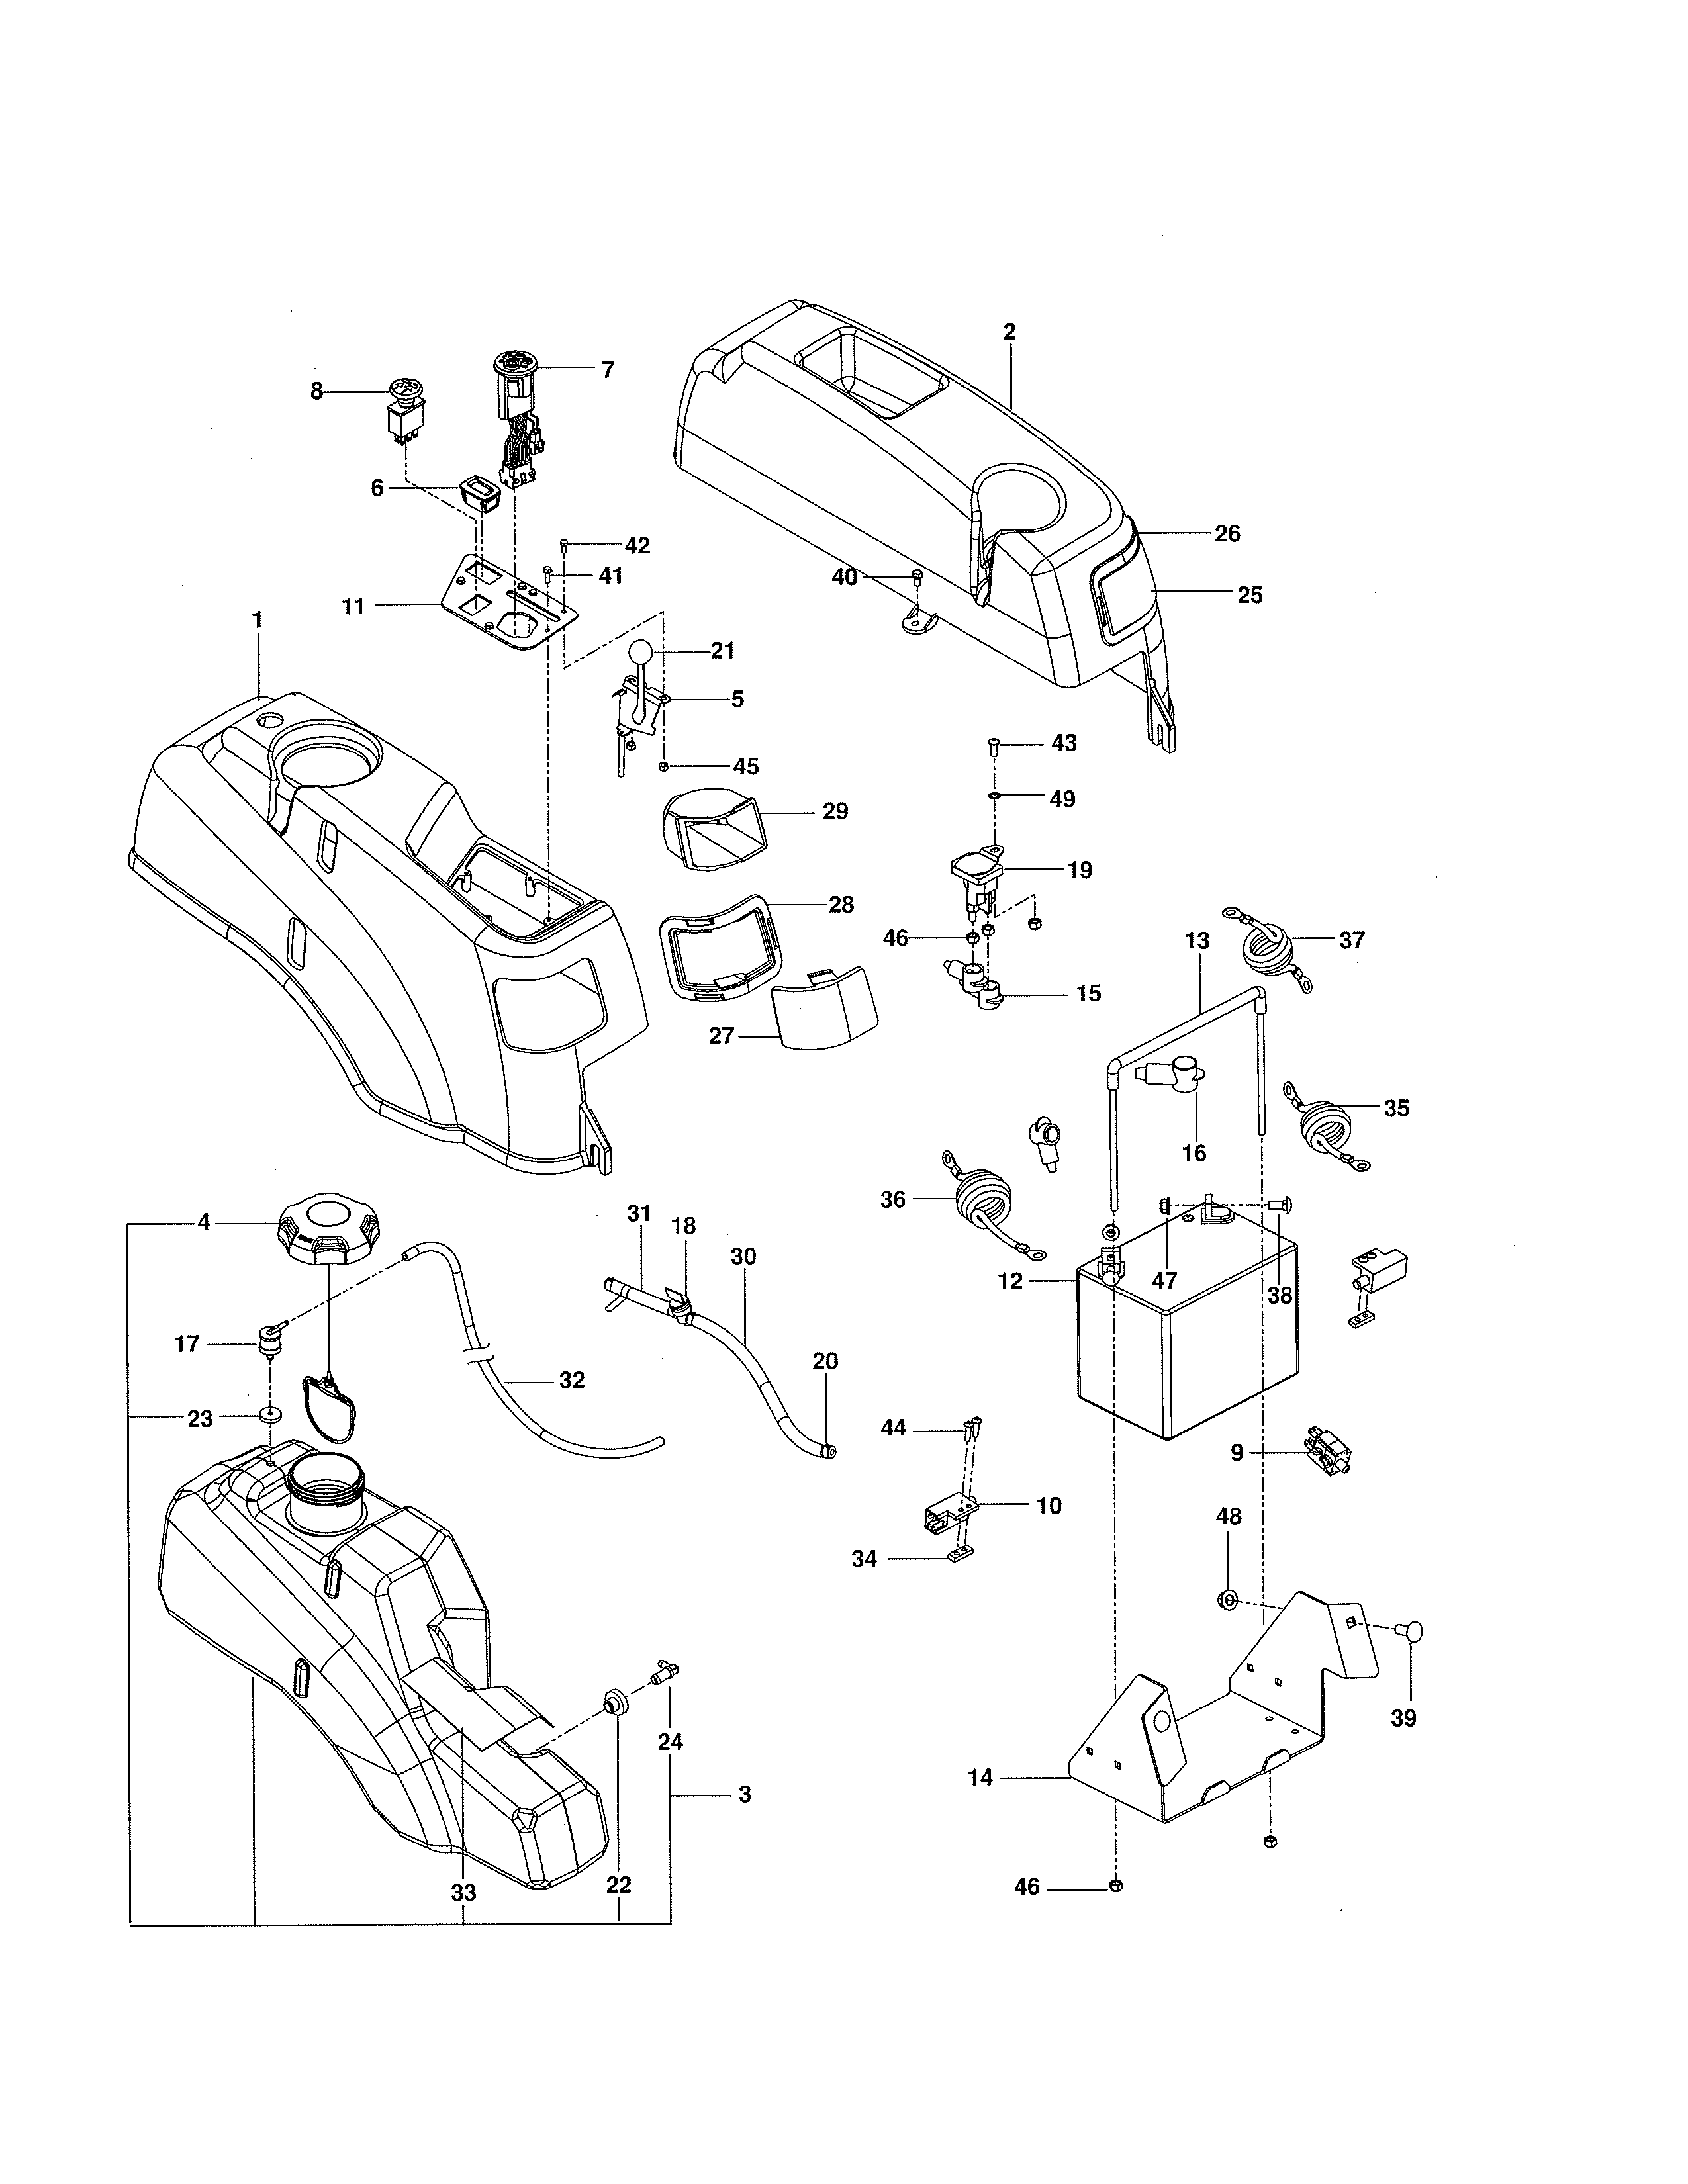 Craftsman  Zero-Turn Riding Mower  Ignition